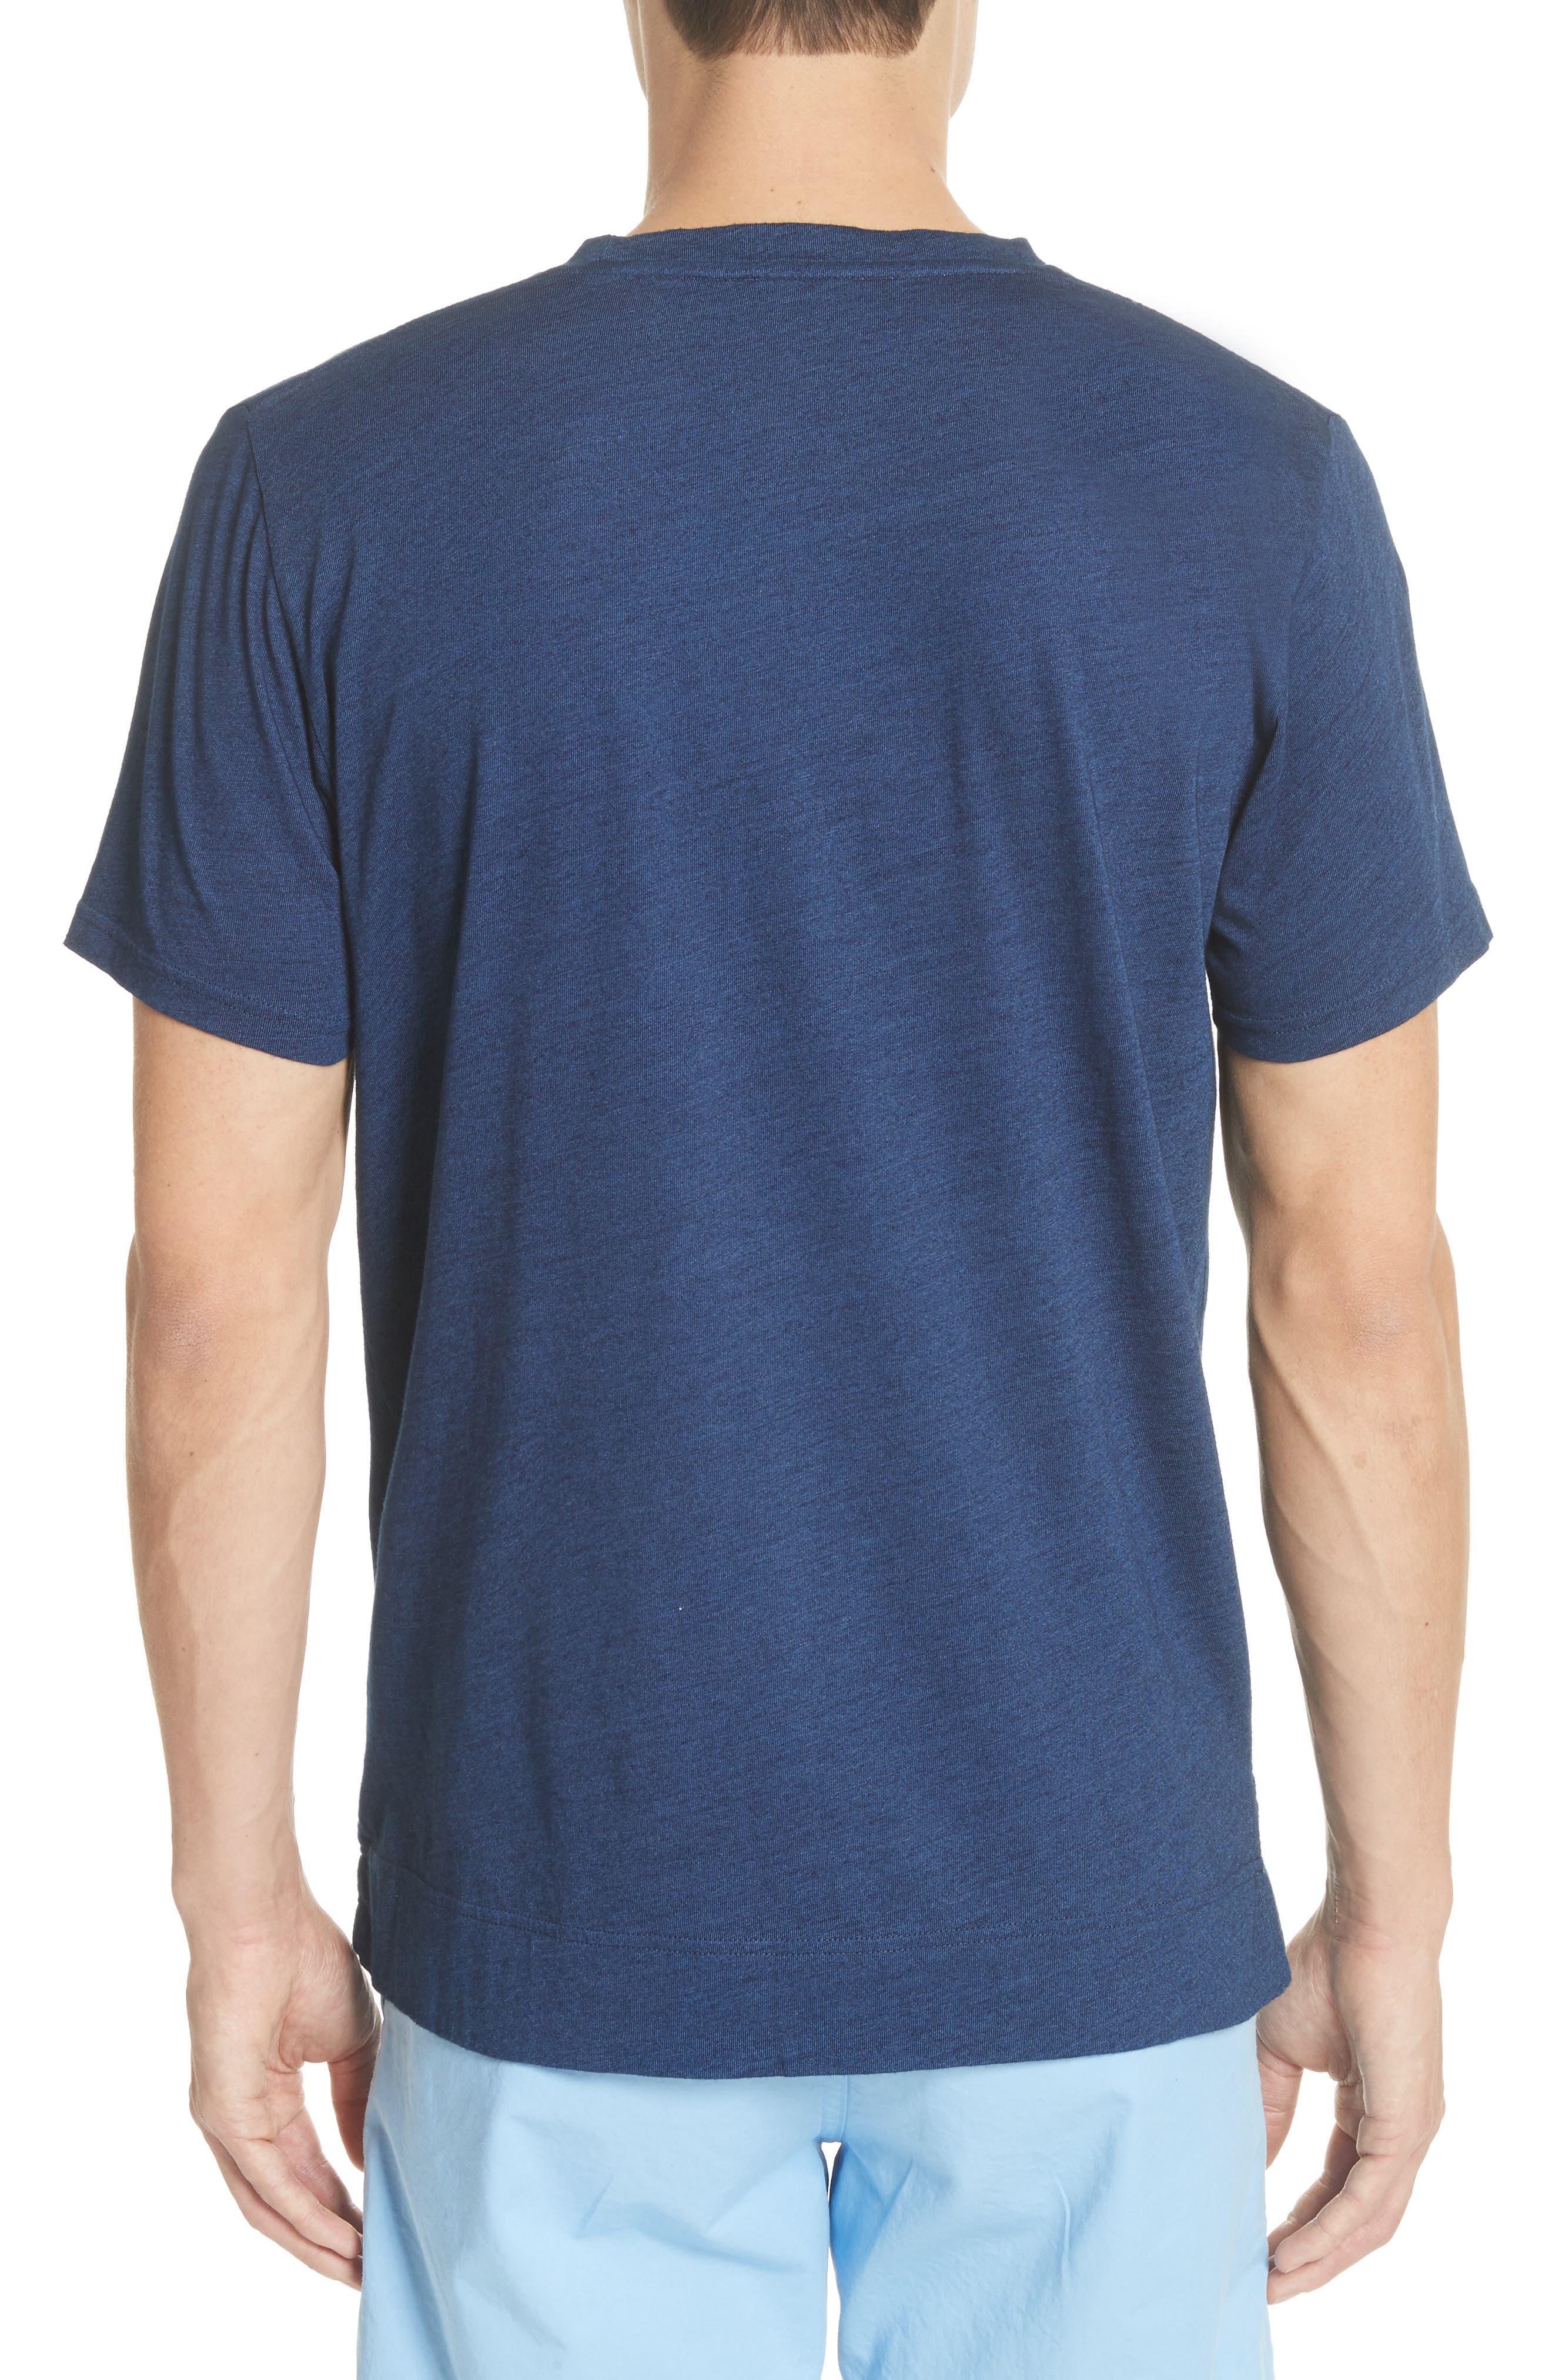 Niels Indigo T-Shirt,                             Alternate thumbnail 2, color,                             Indigo